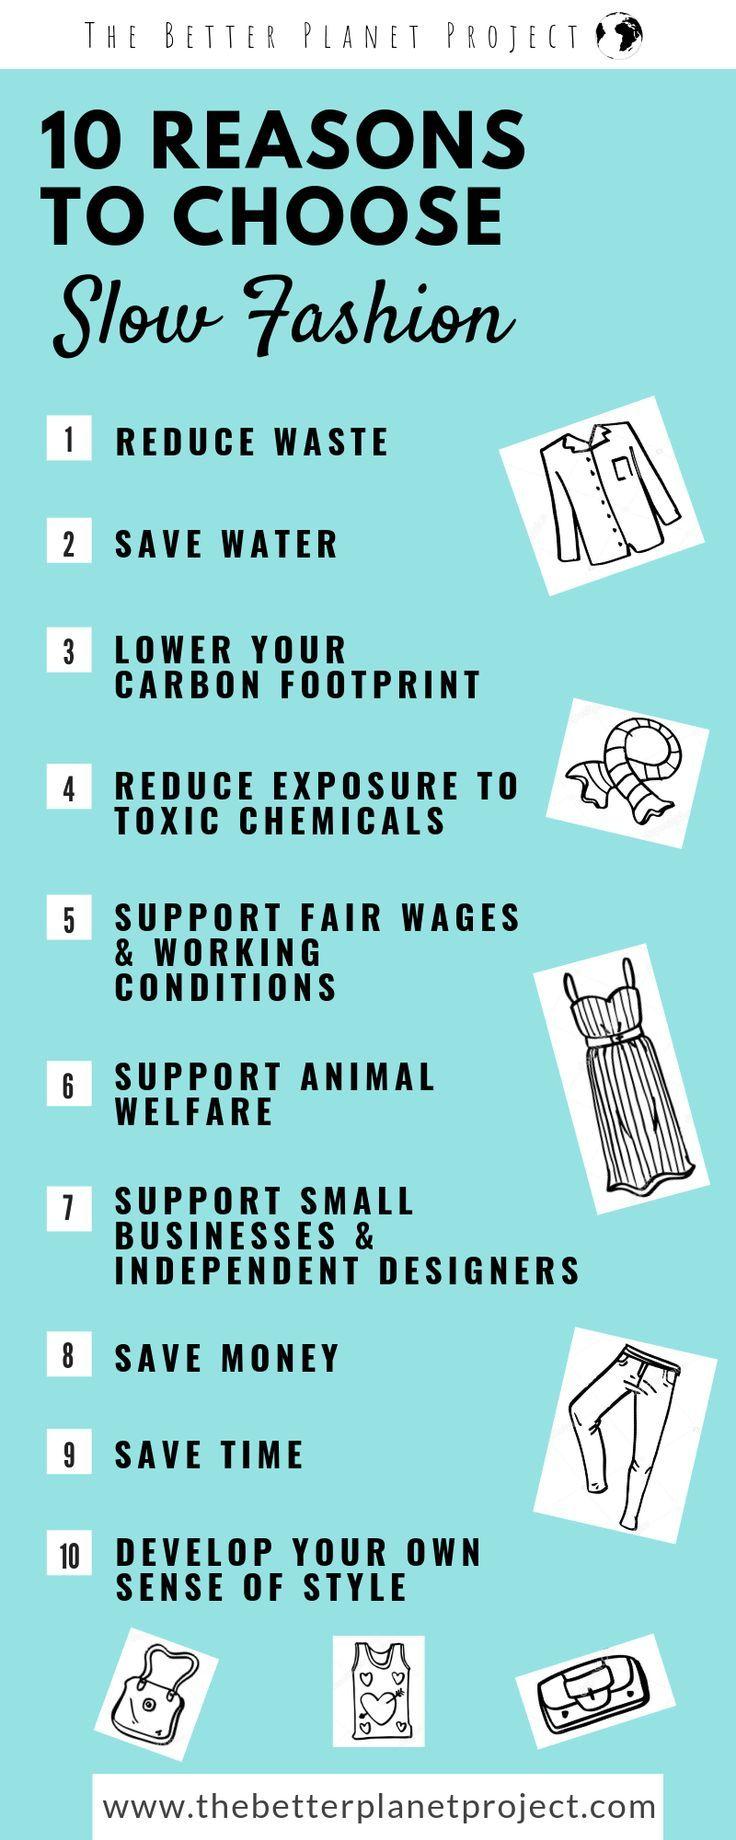 10 Reasons To Choose Slow Fashion In 2020 Slow Fashion Slow Fashion Brands Eco Friendly Fashion